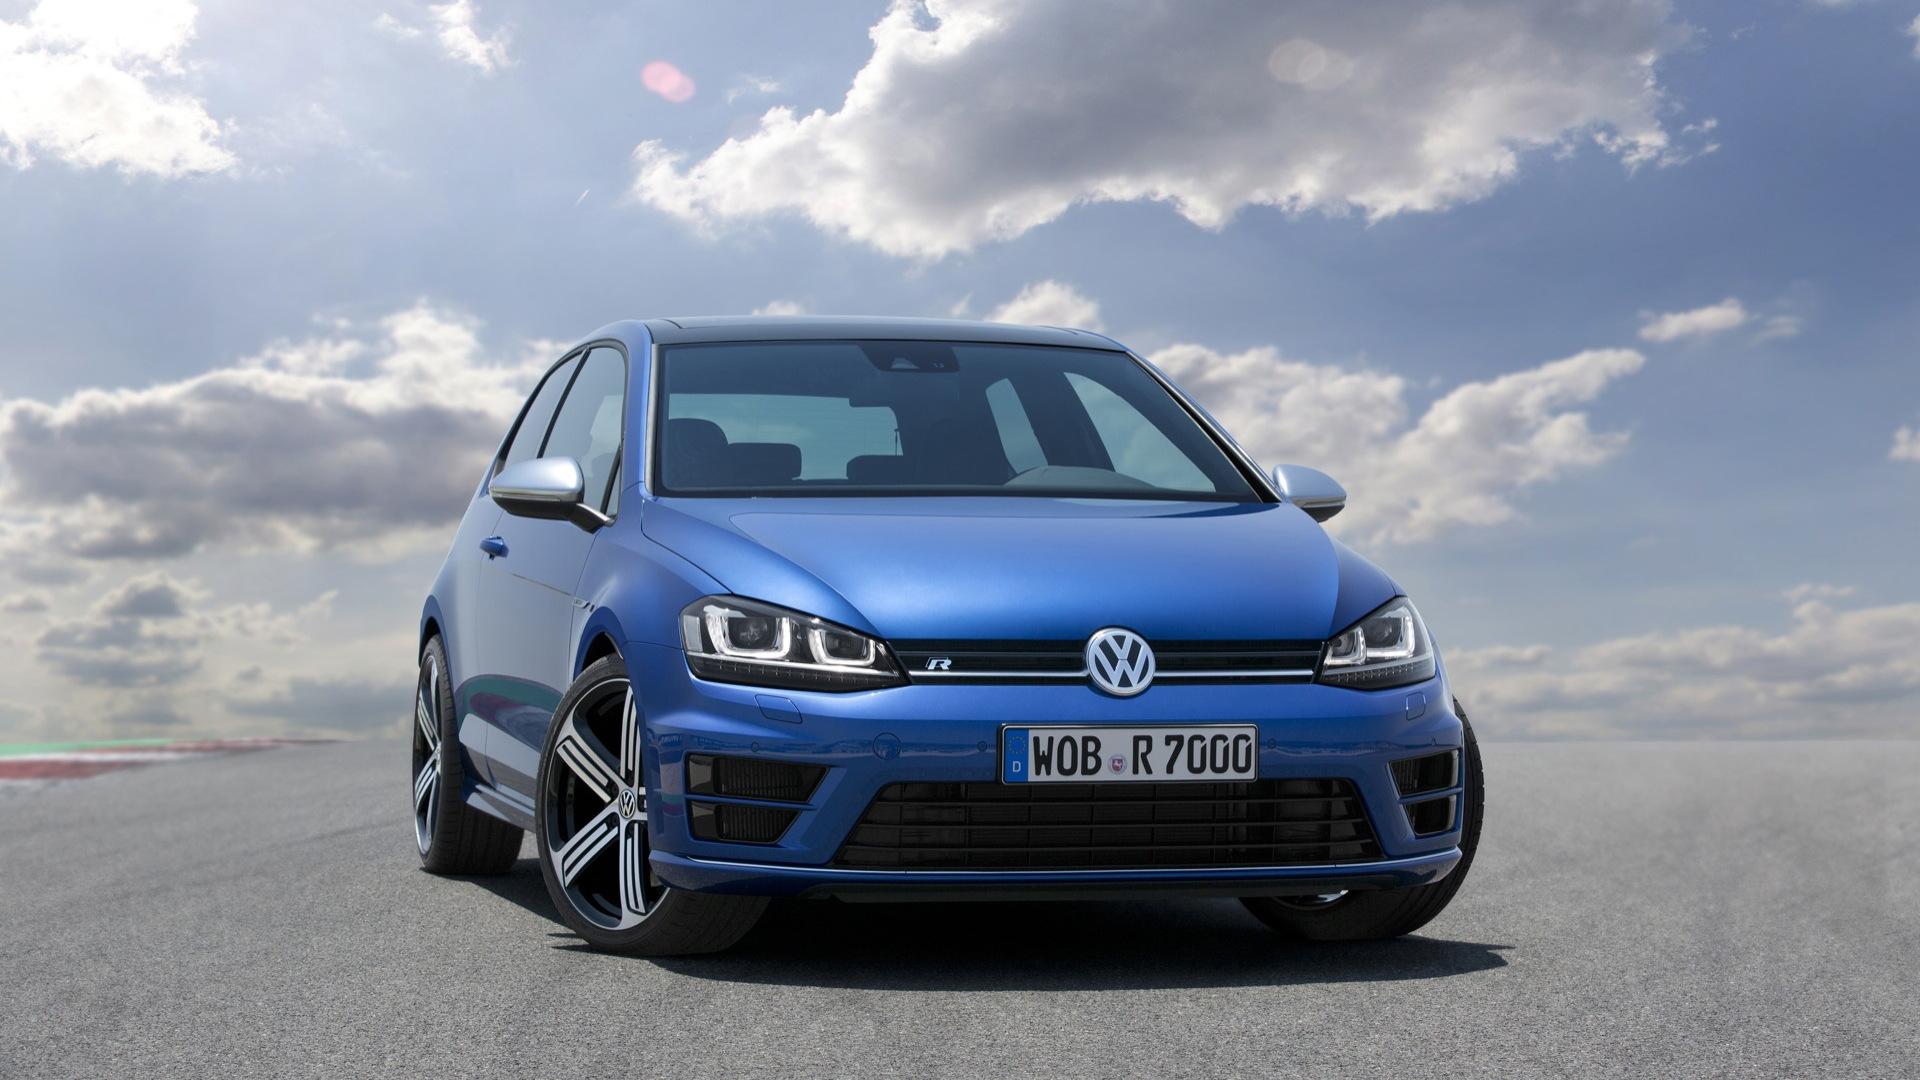 2015 Volkswagen Golf R (Euro spec)